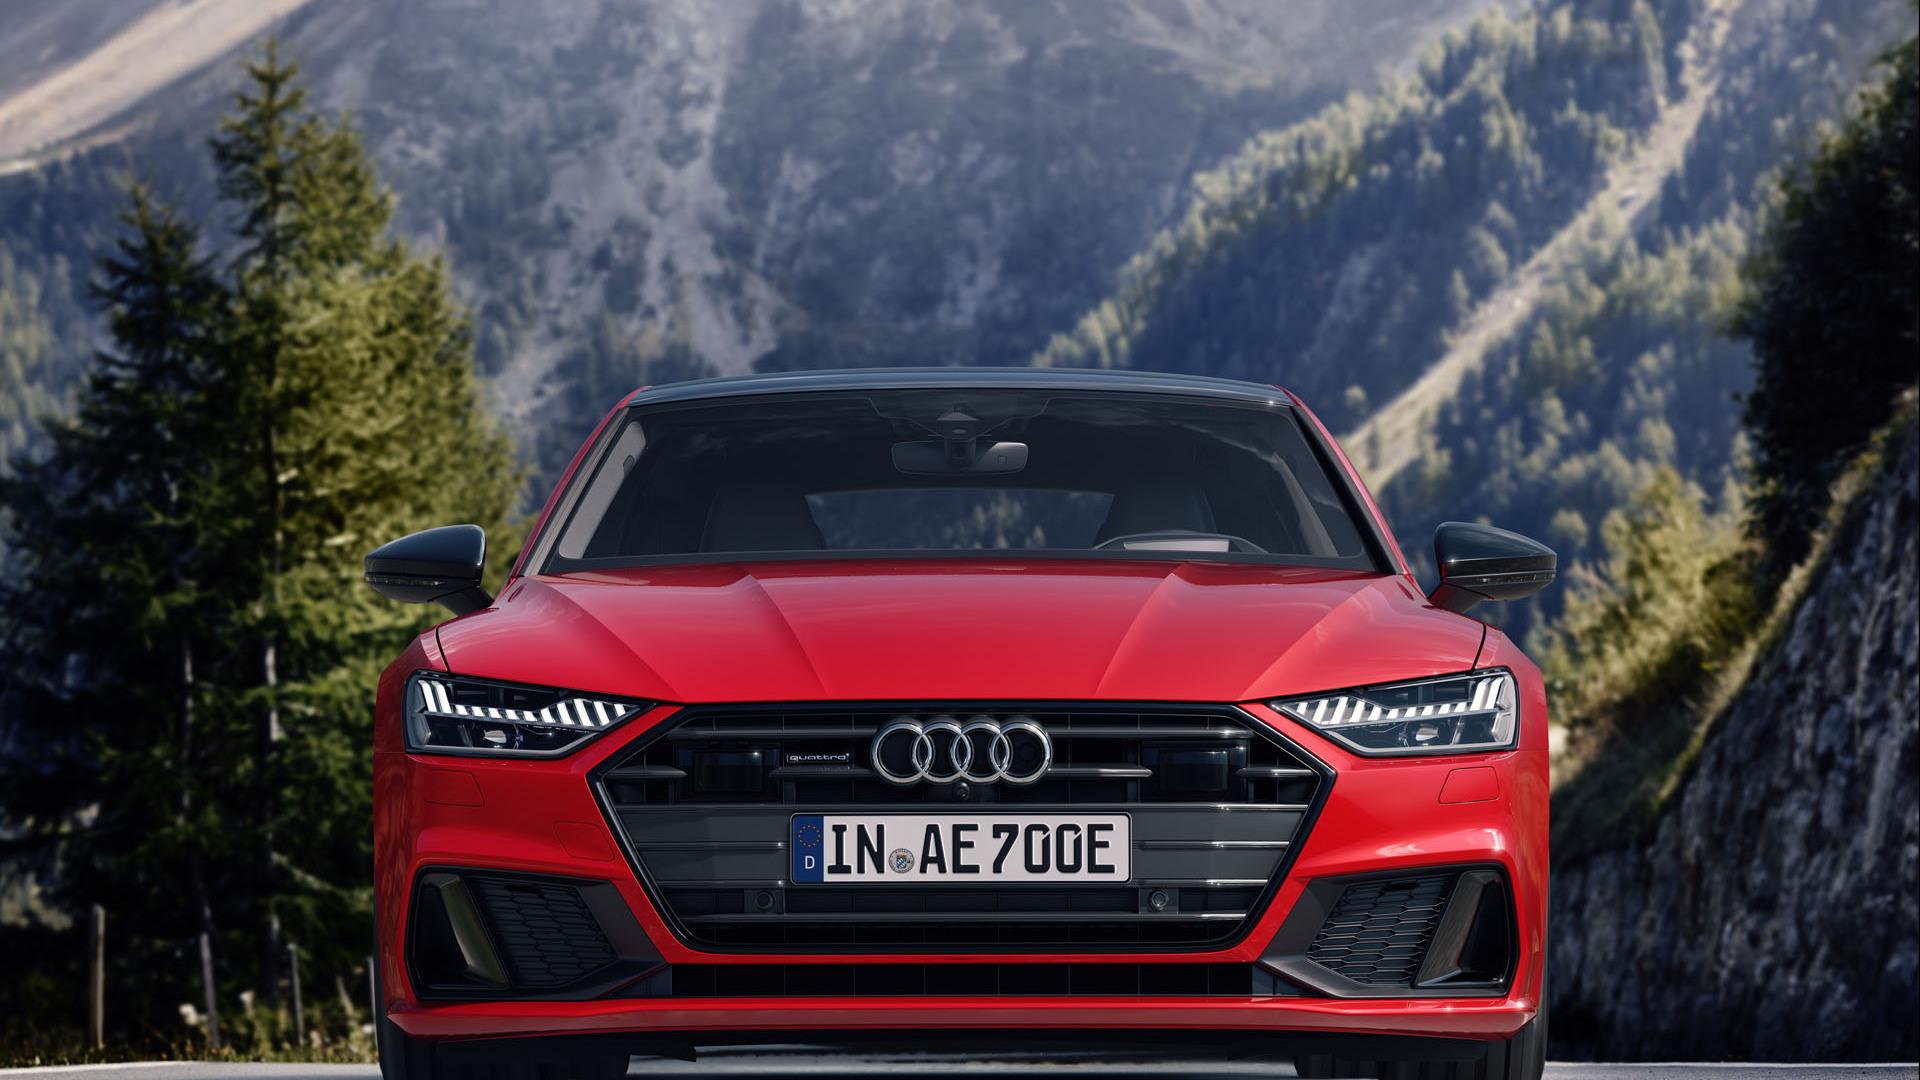 2021 Audi A7 Sportback 55 TFSI e plug-in hybrid